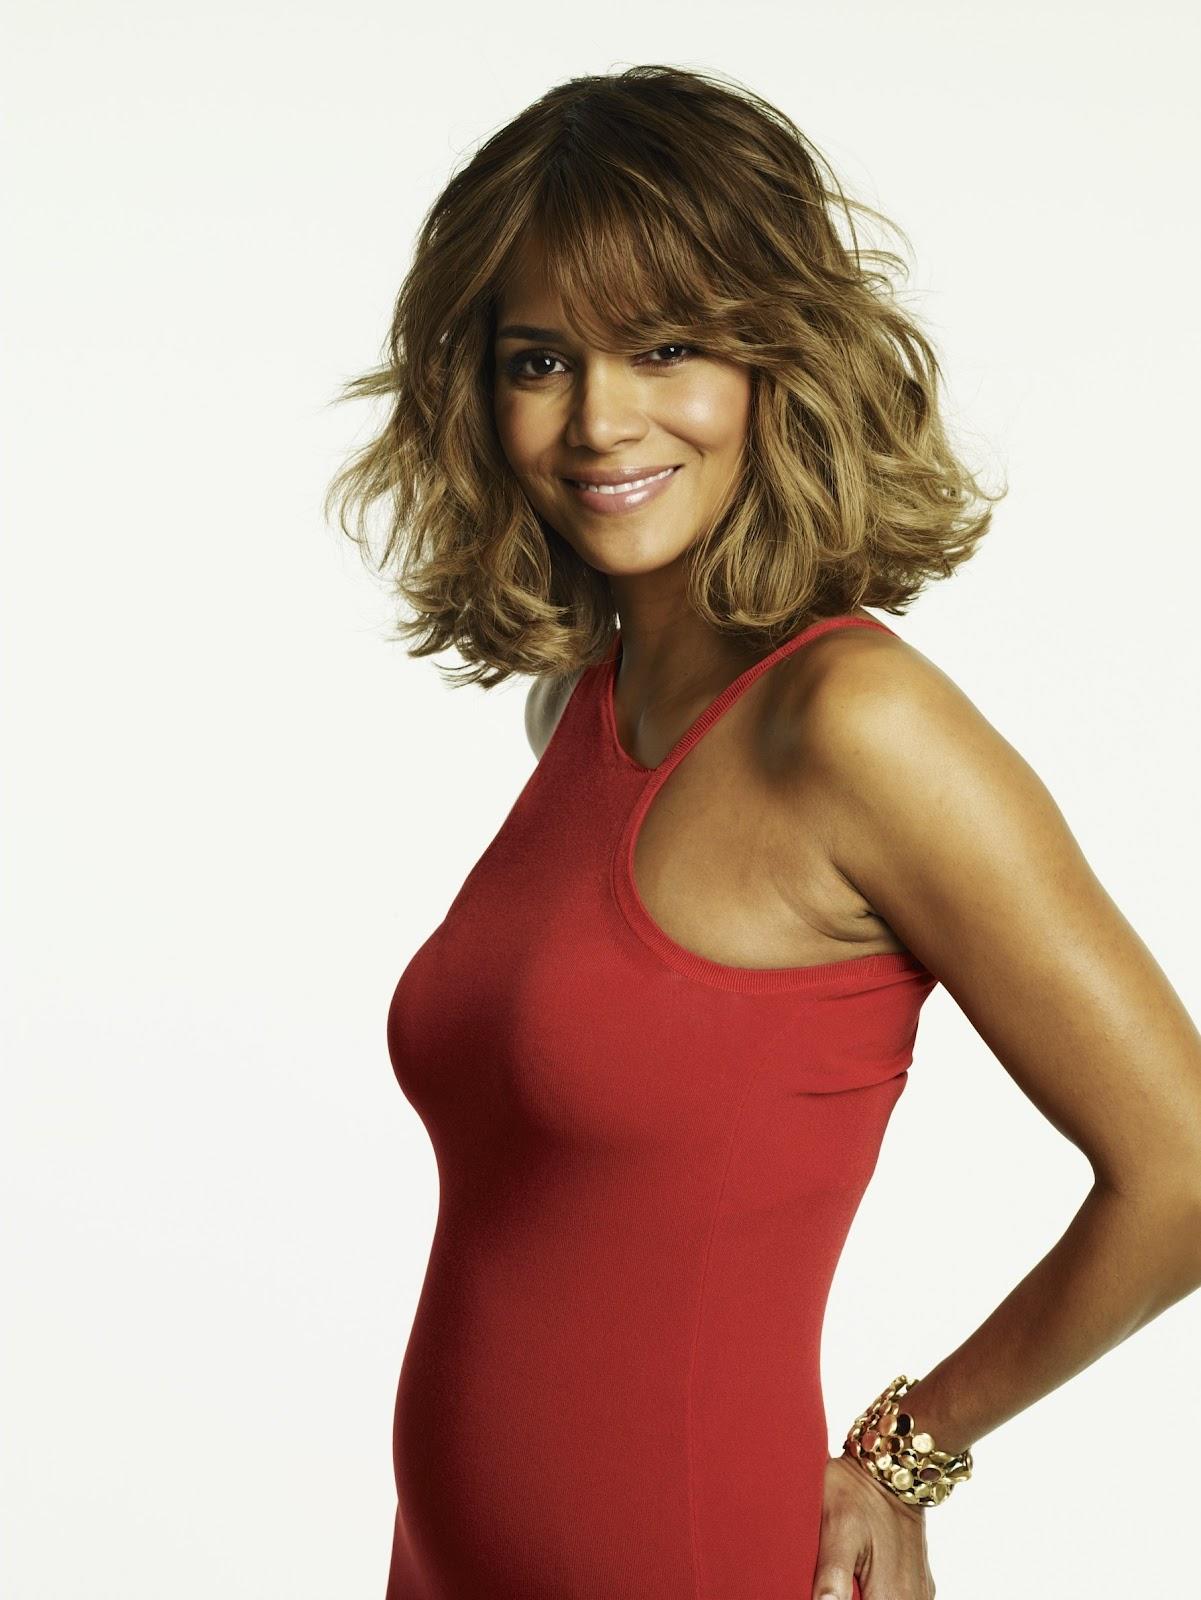 Imagery of nude celebrities - Wikipedia